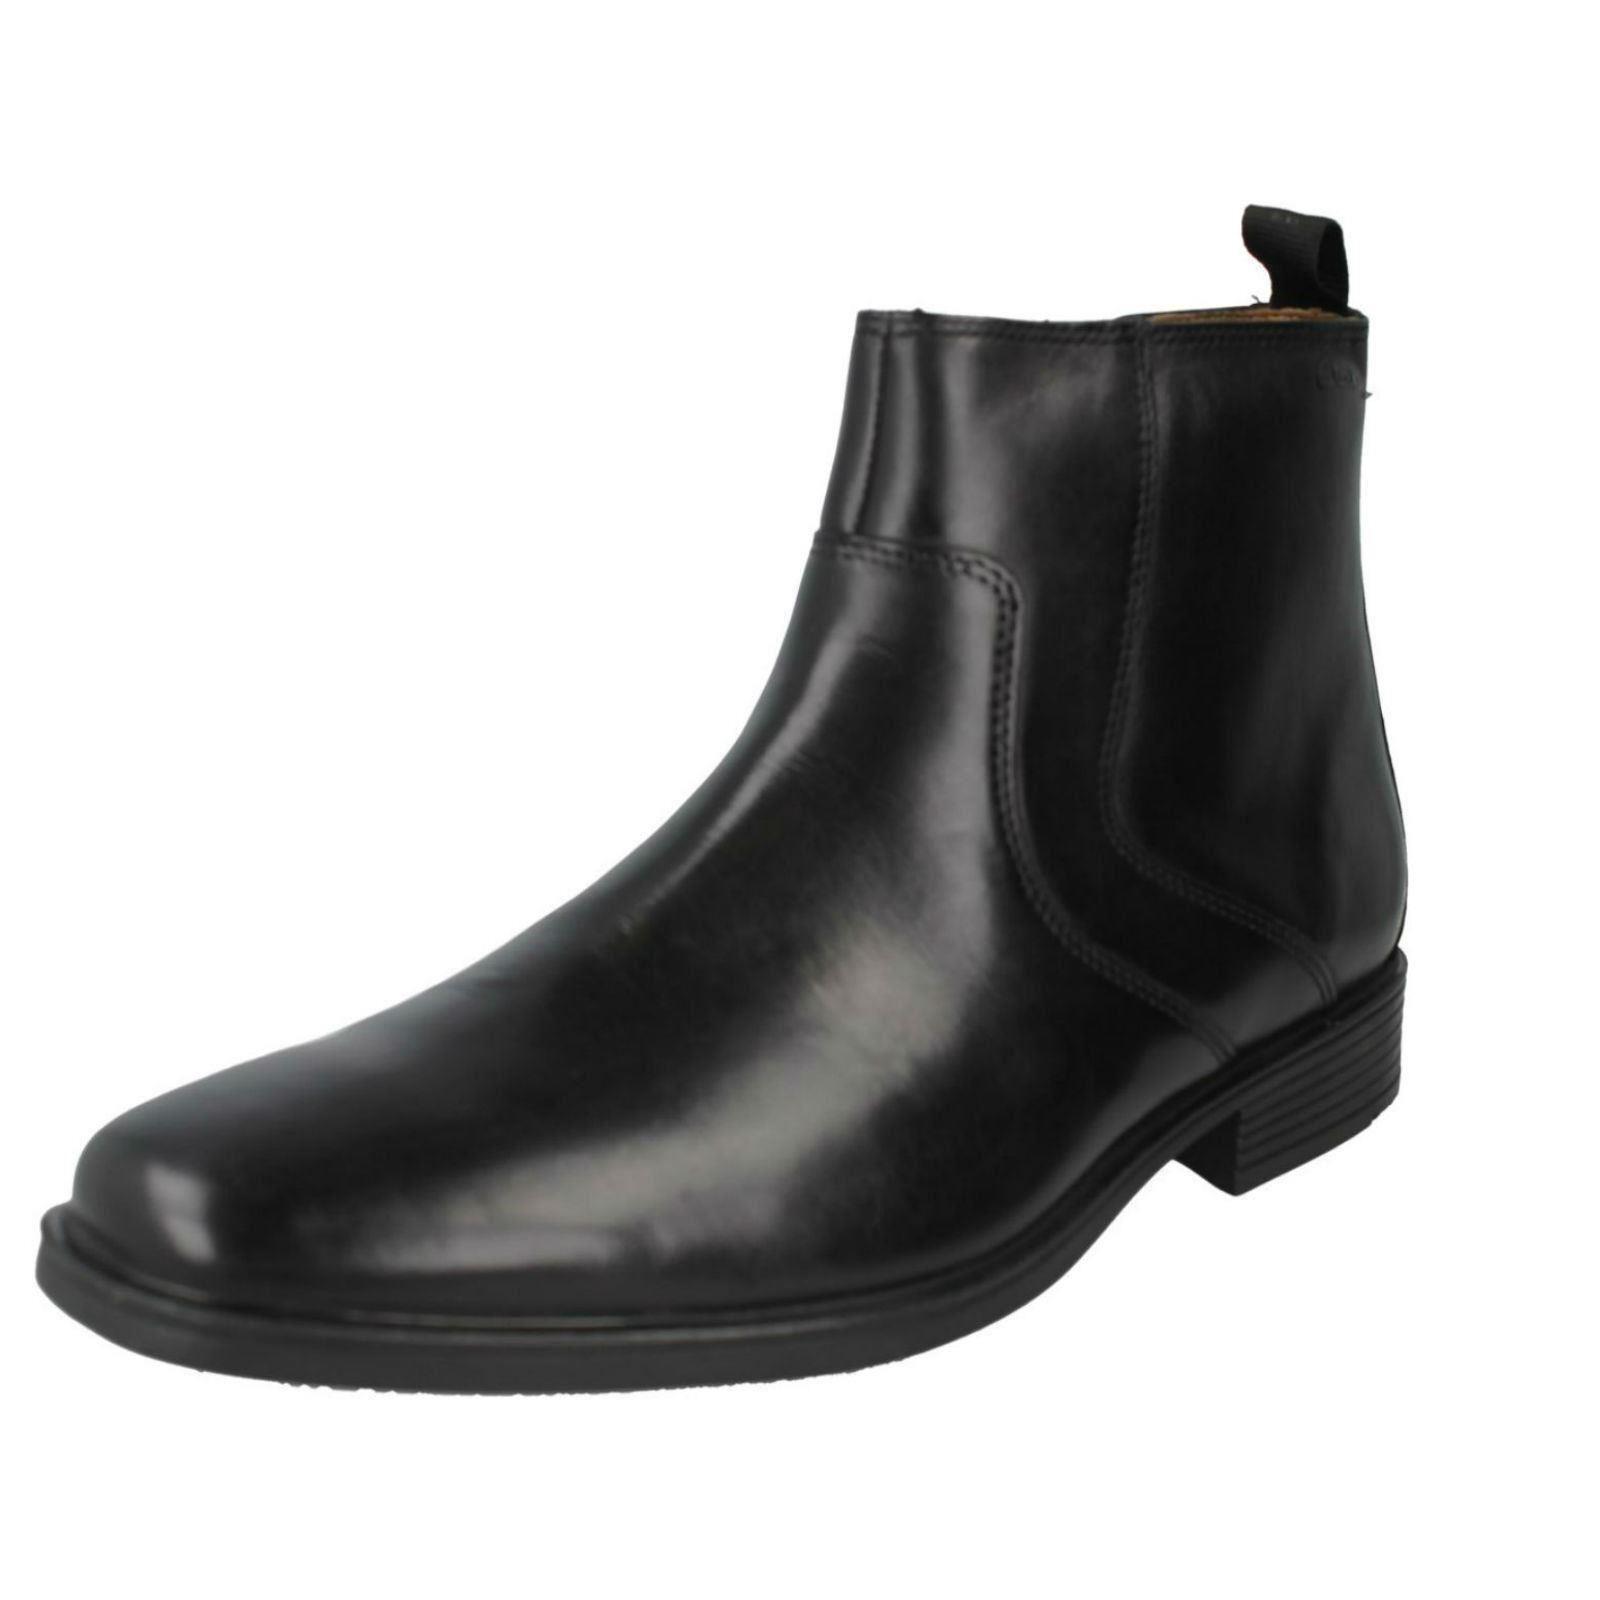 Clarks'Tilden Zip 'Men's Smart nero Leather Ankle stivali  G Fitting  marchi di stilisti economici